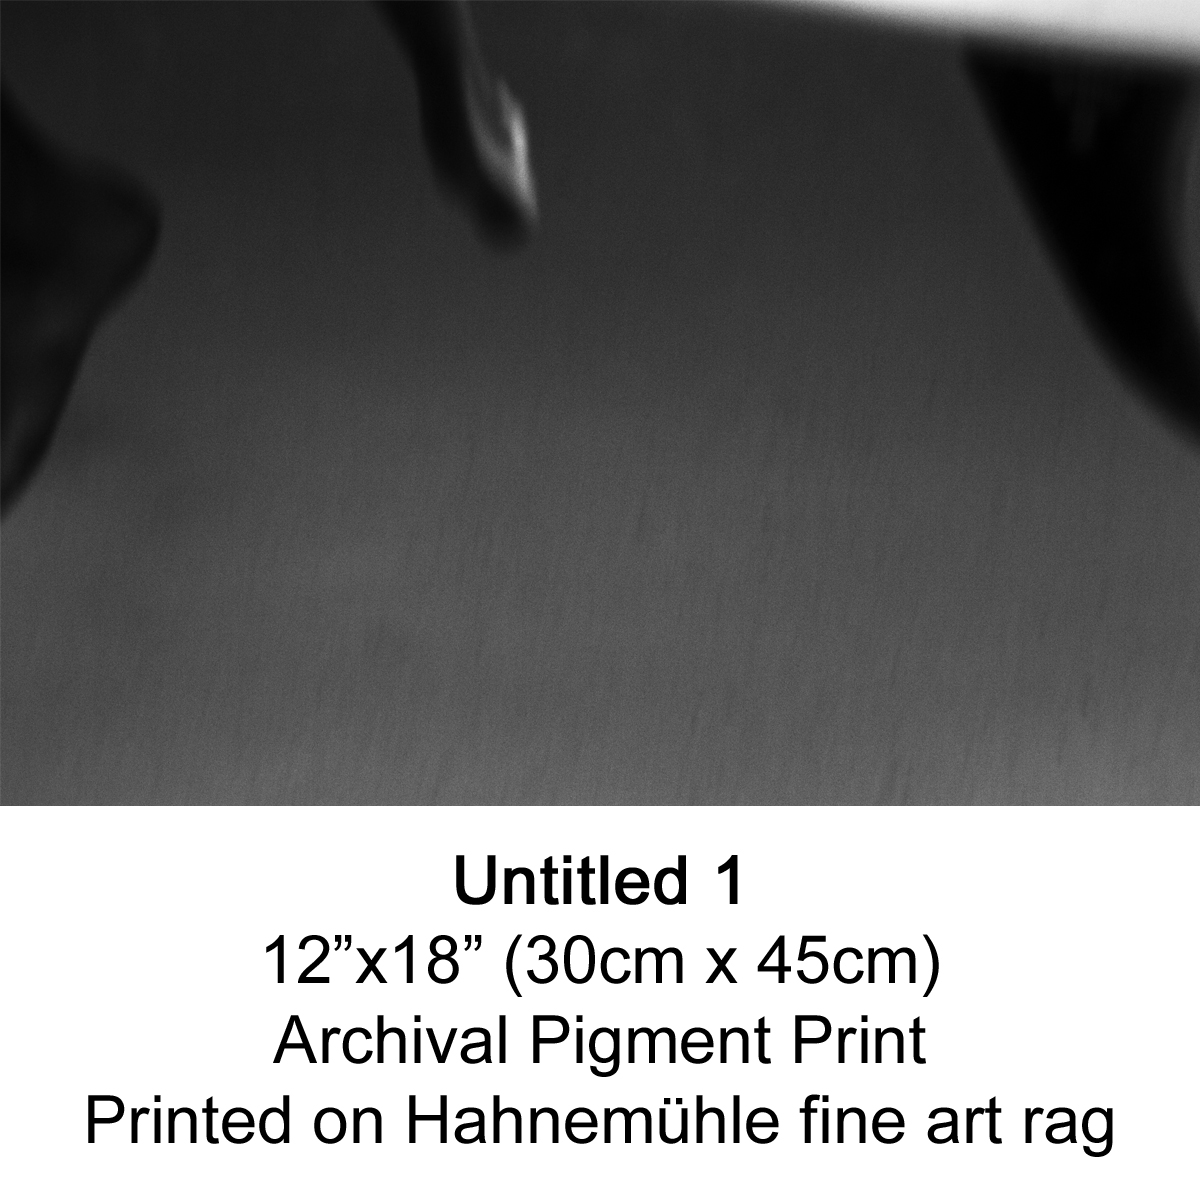 Untitled 1 by fran miller.jpg